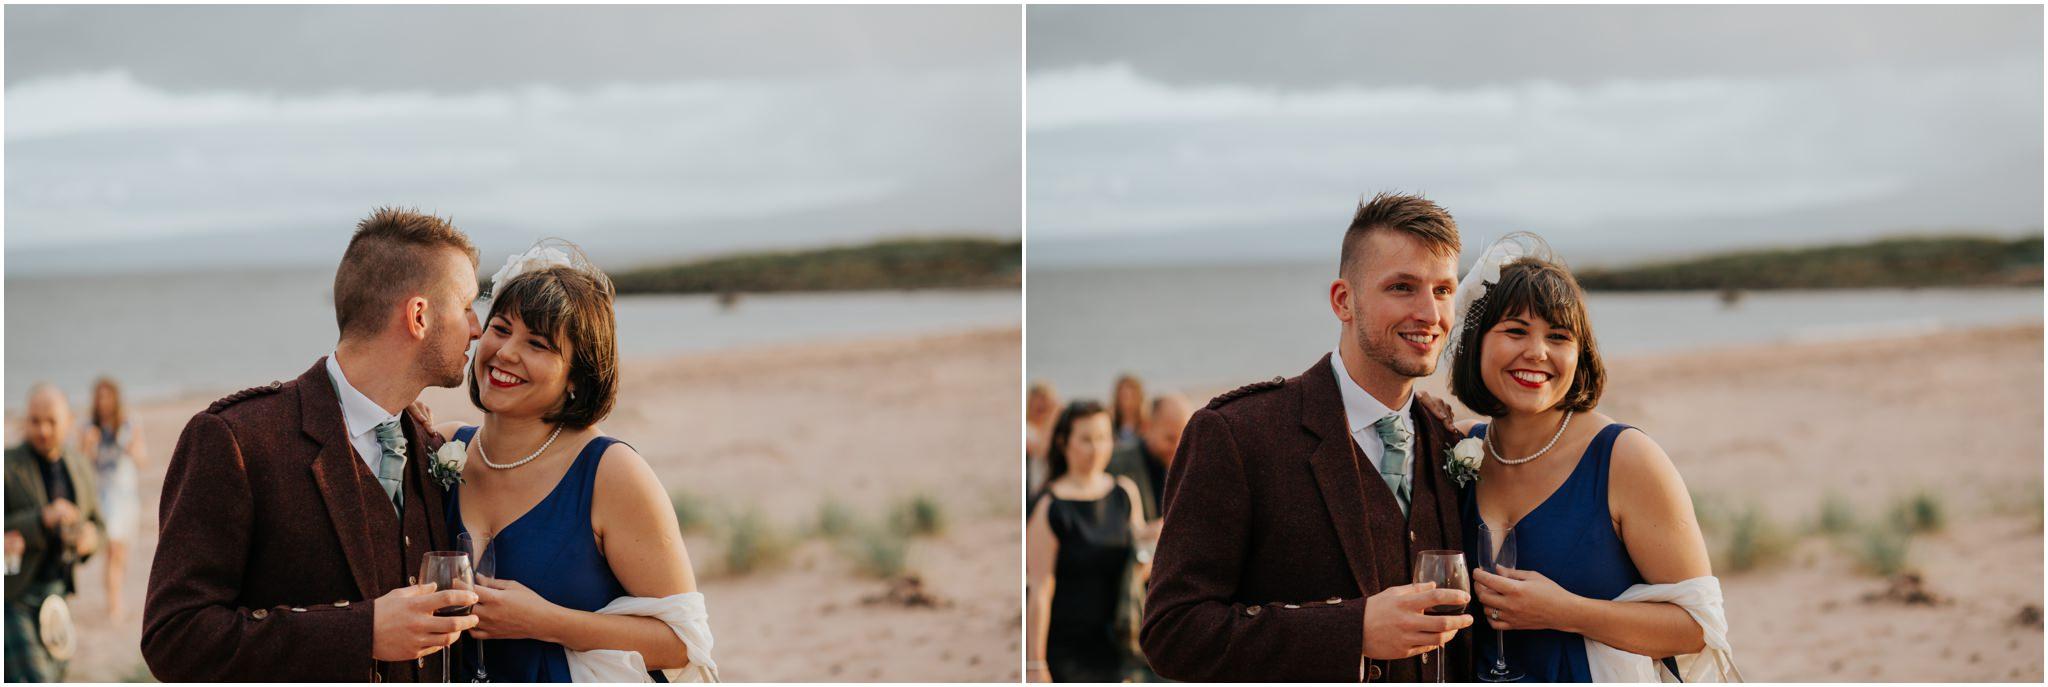 Photography 78 - Glasgow Wedding Photographer - Jordan & Abi - The Waterside Hotel, West Kilbride_0145.jpg